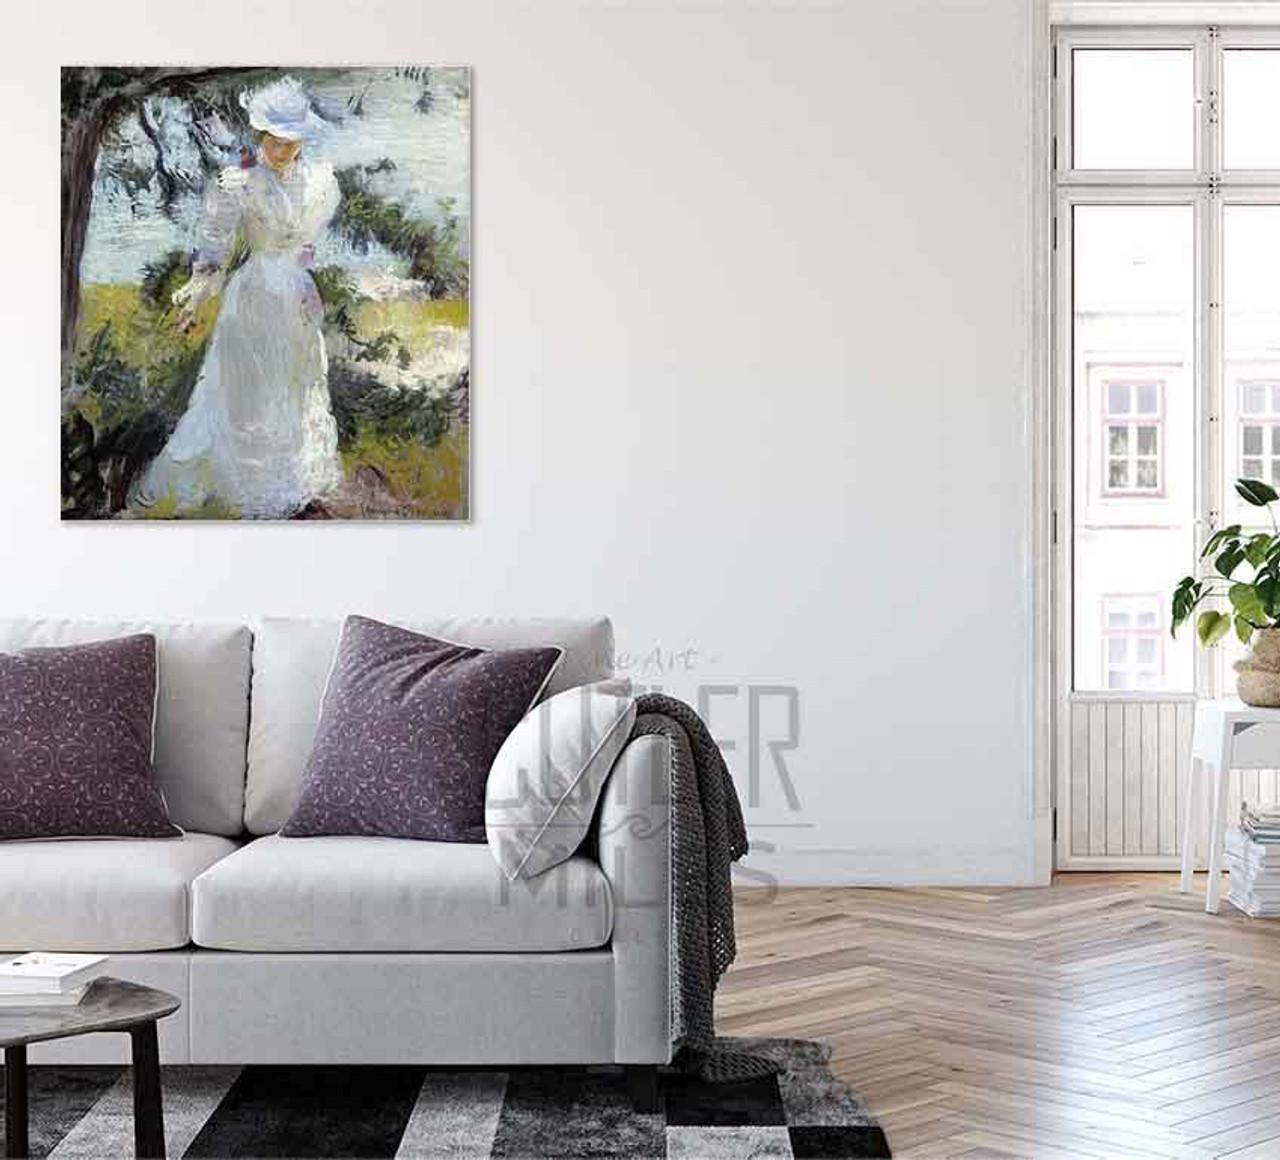 my wife emeline in a garden by edmund tarbell